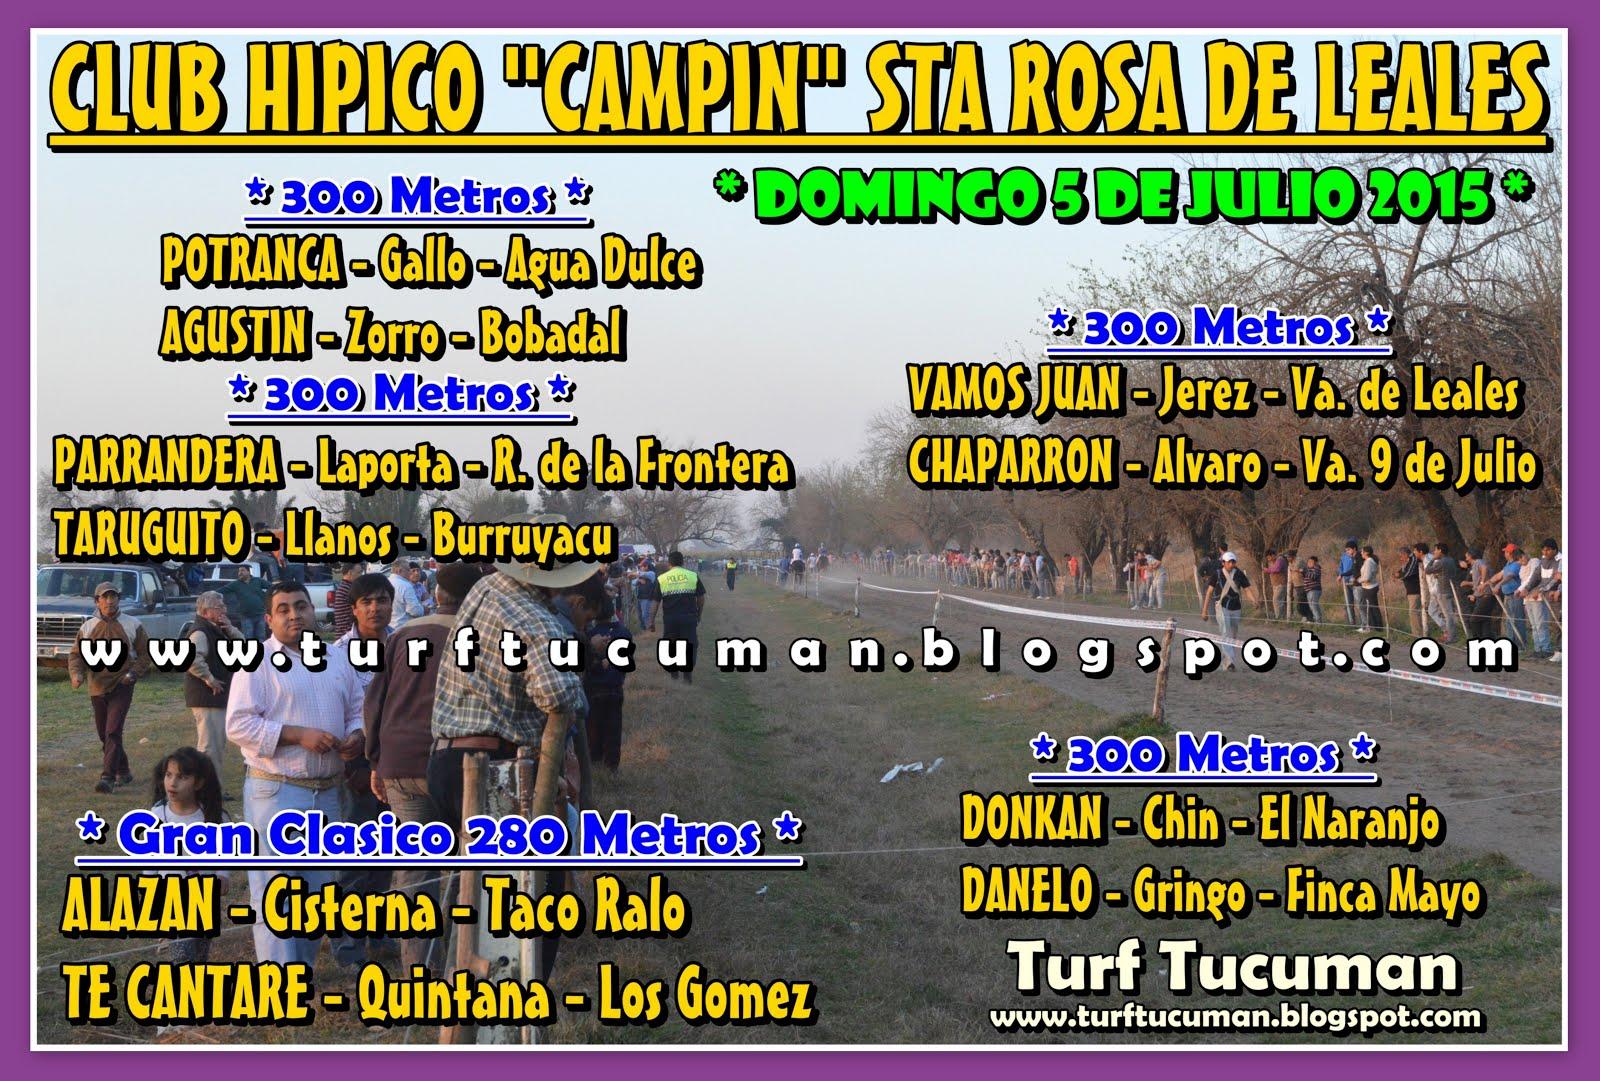 PROG CAMPIN